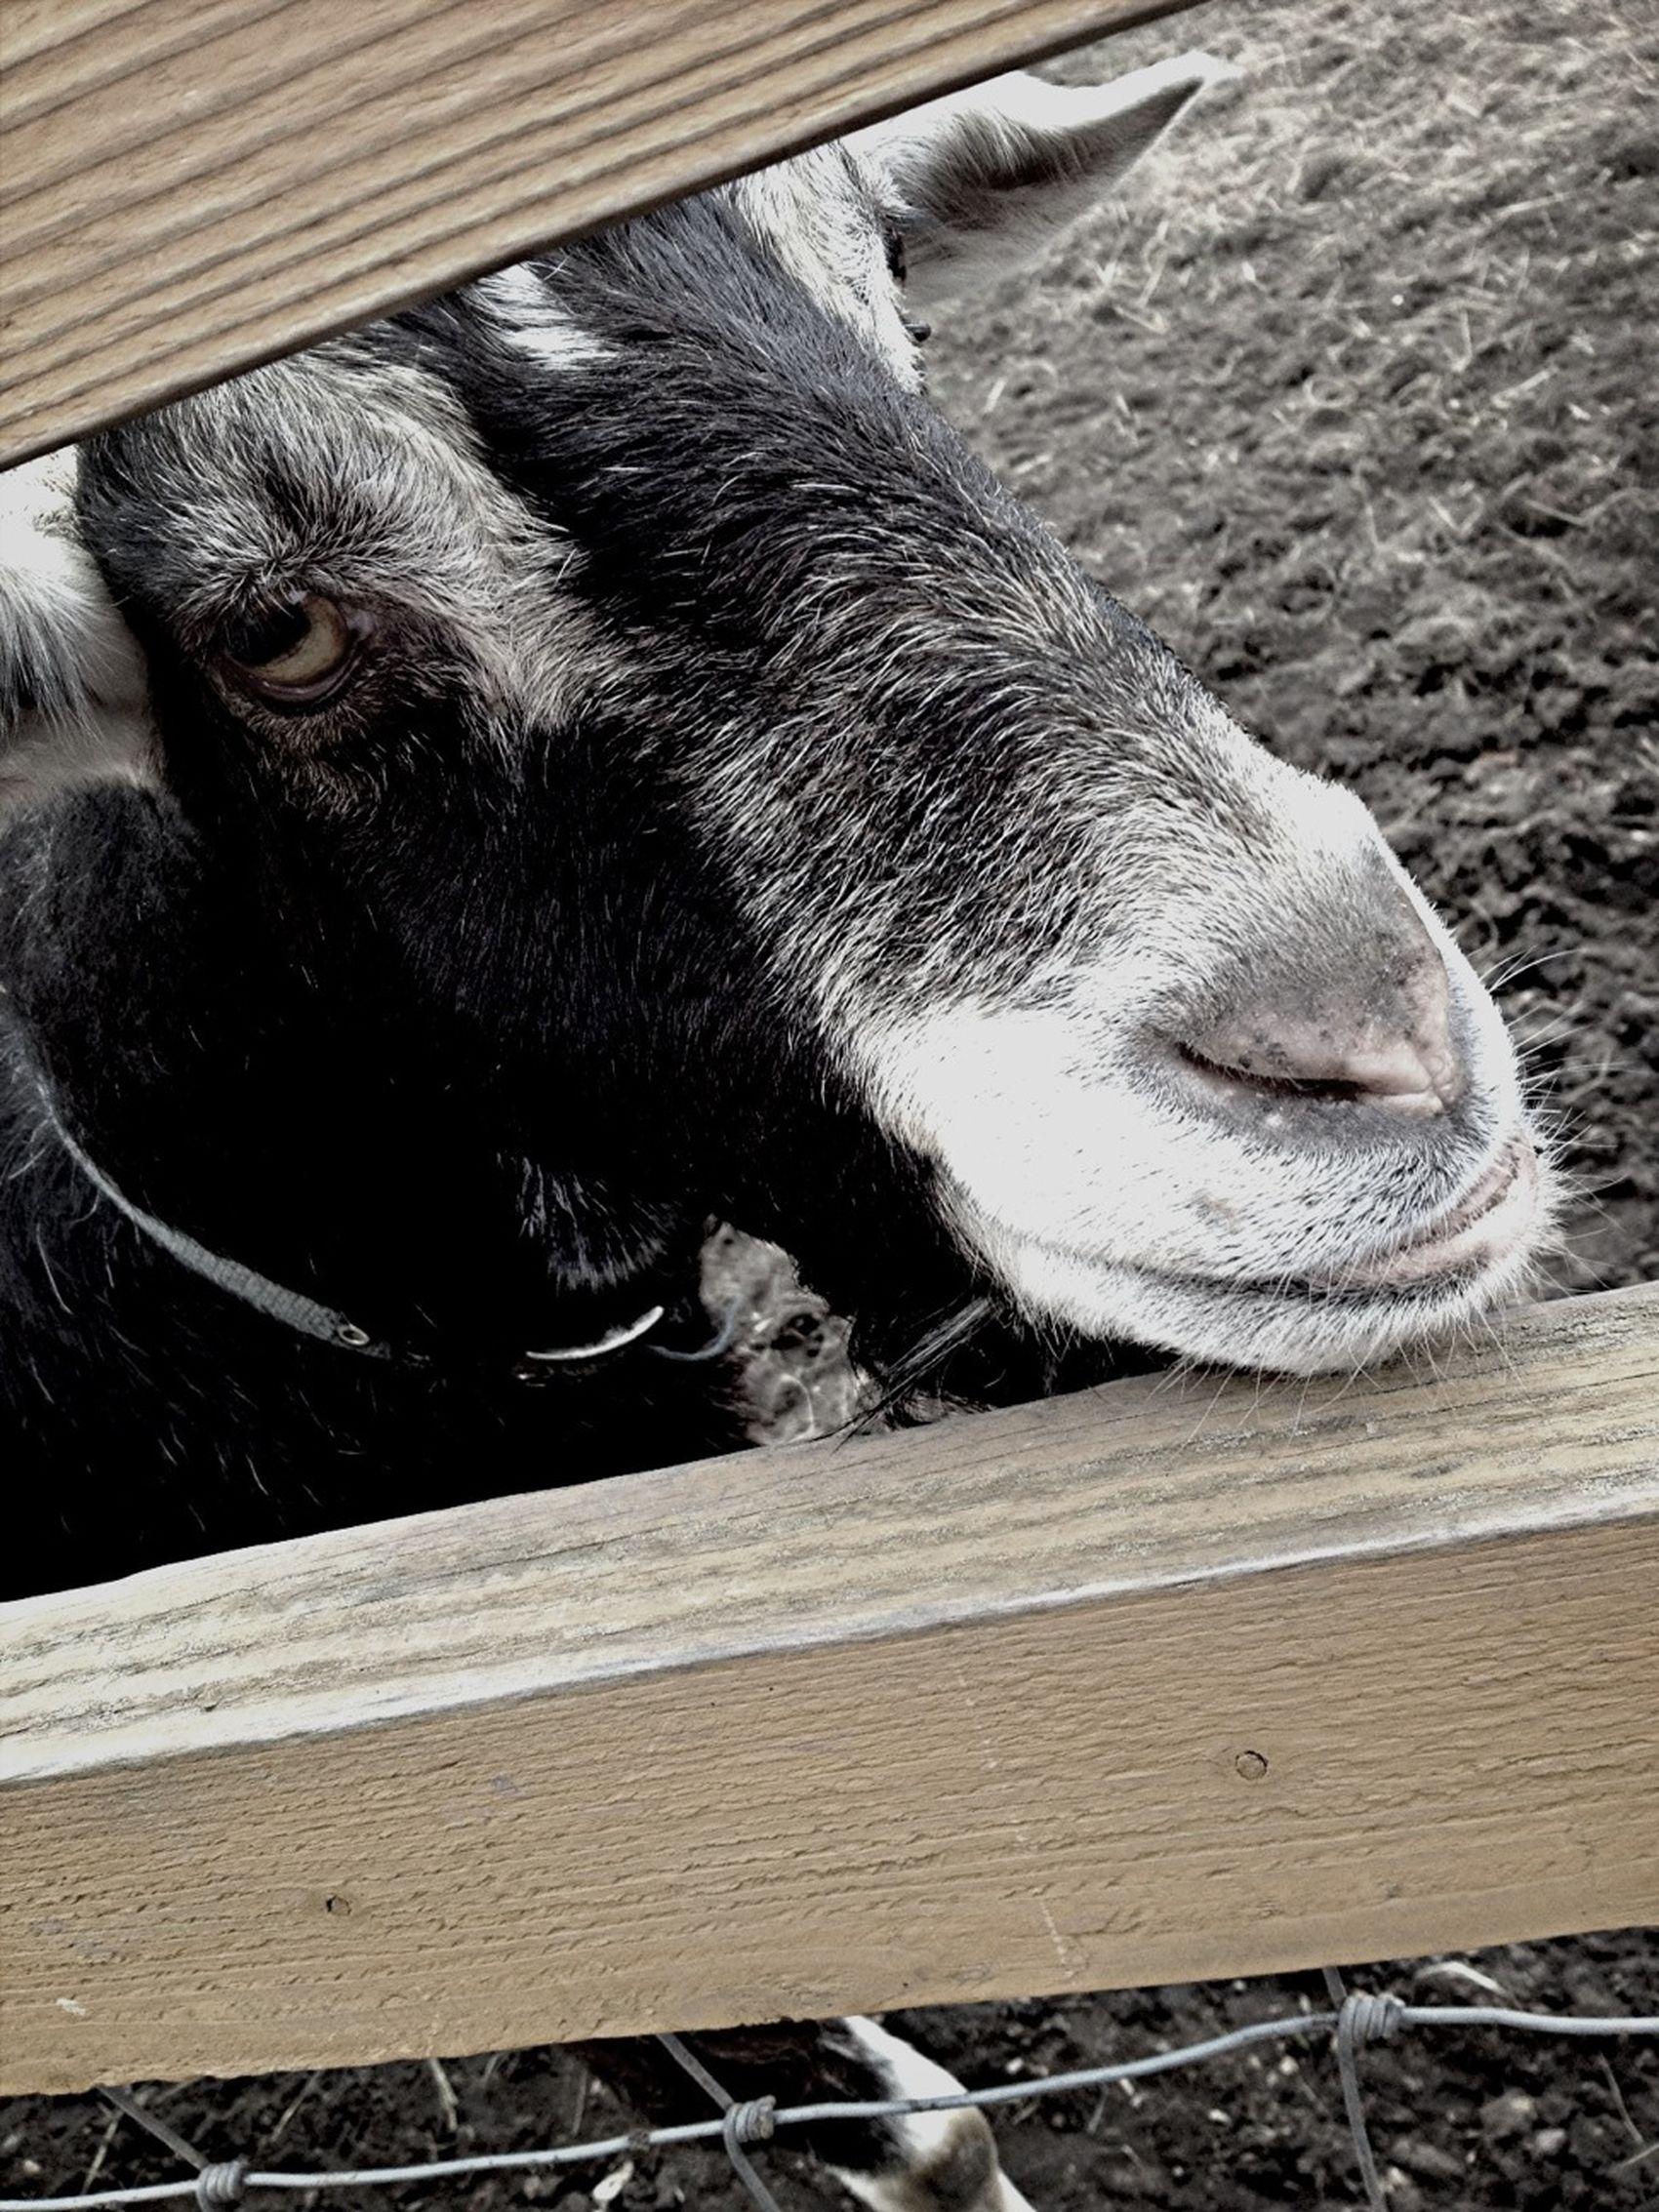 #goat #farm #animal #nottingham #cute